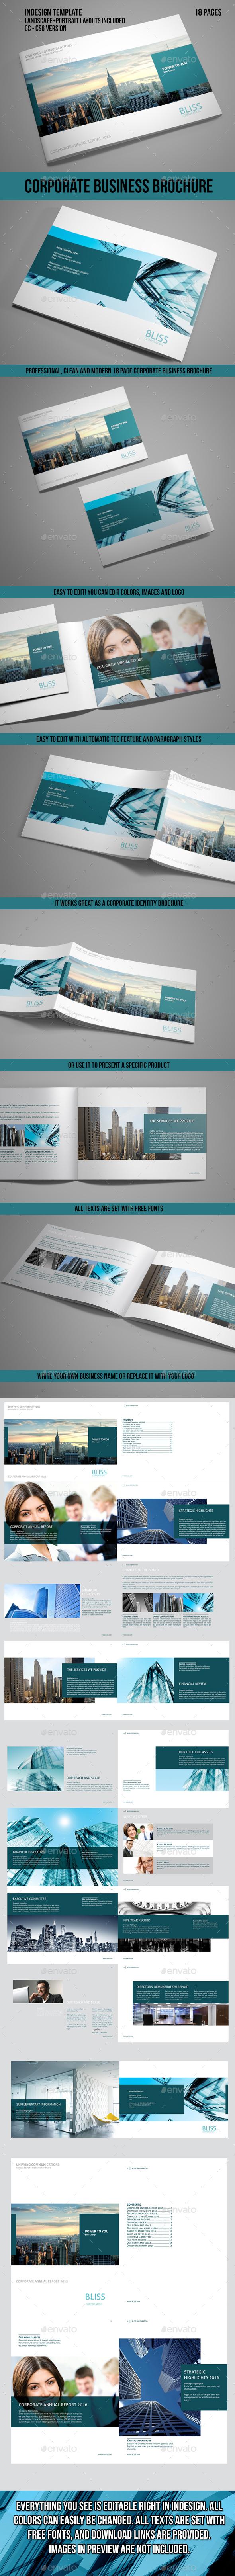 Corporate Business Brochure Indesign Template - Corporate Brochures